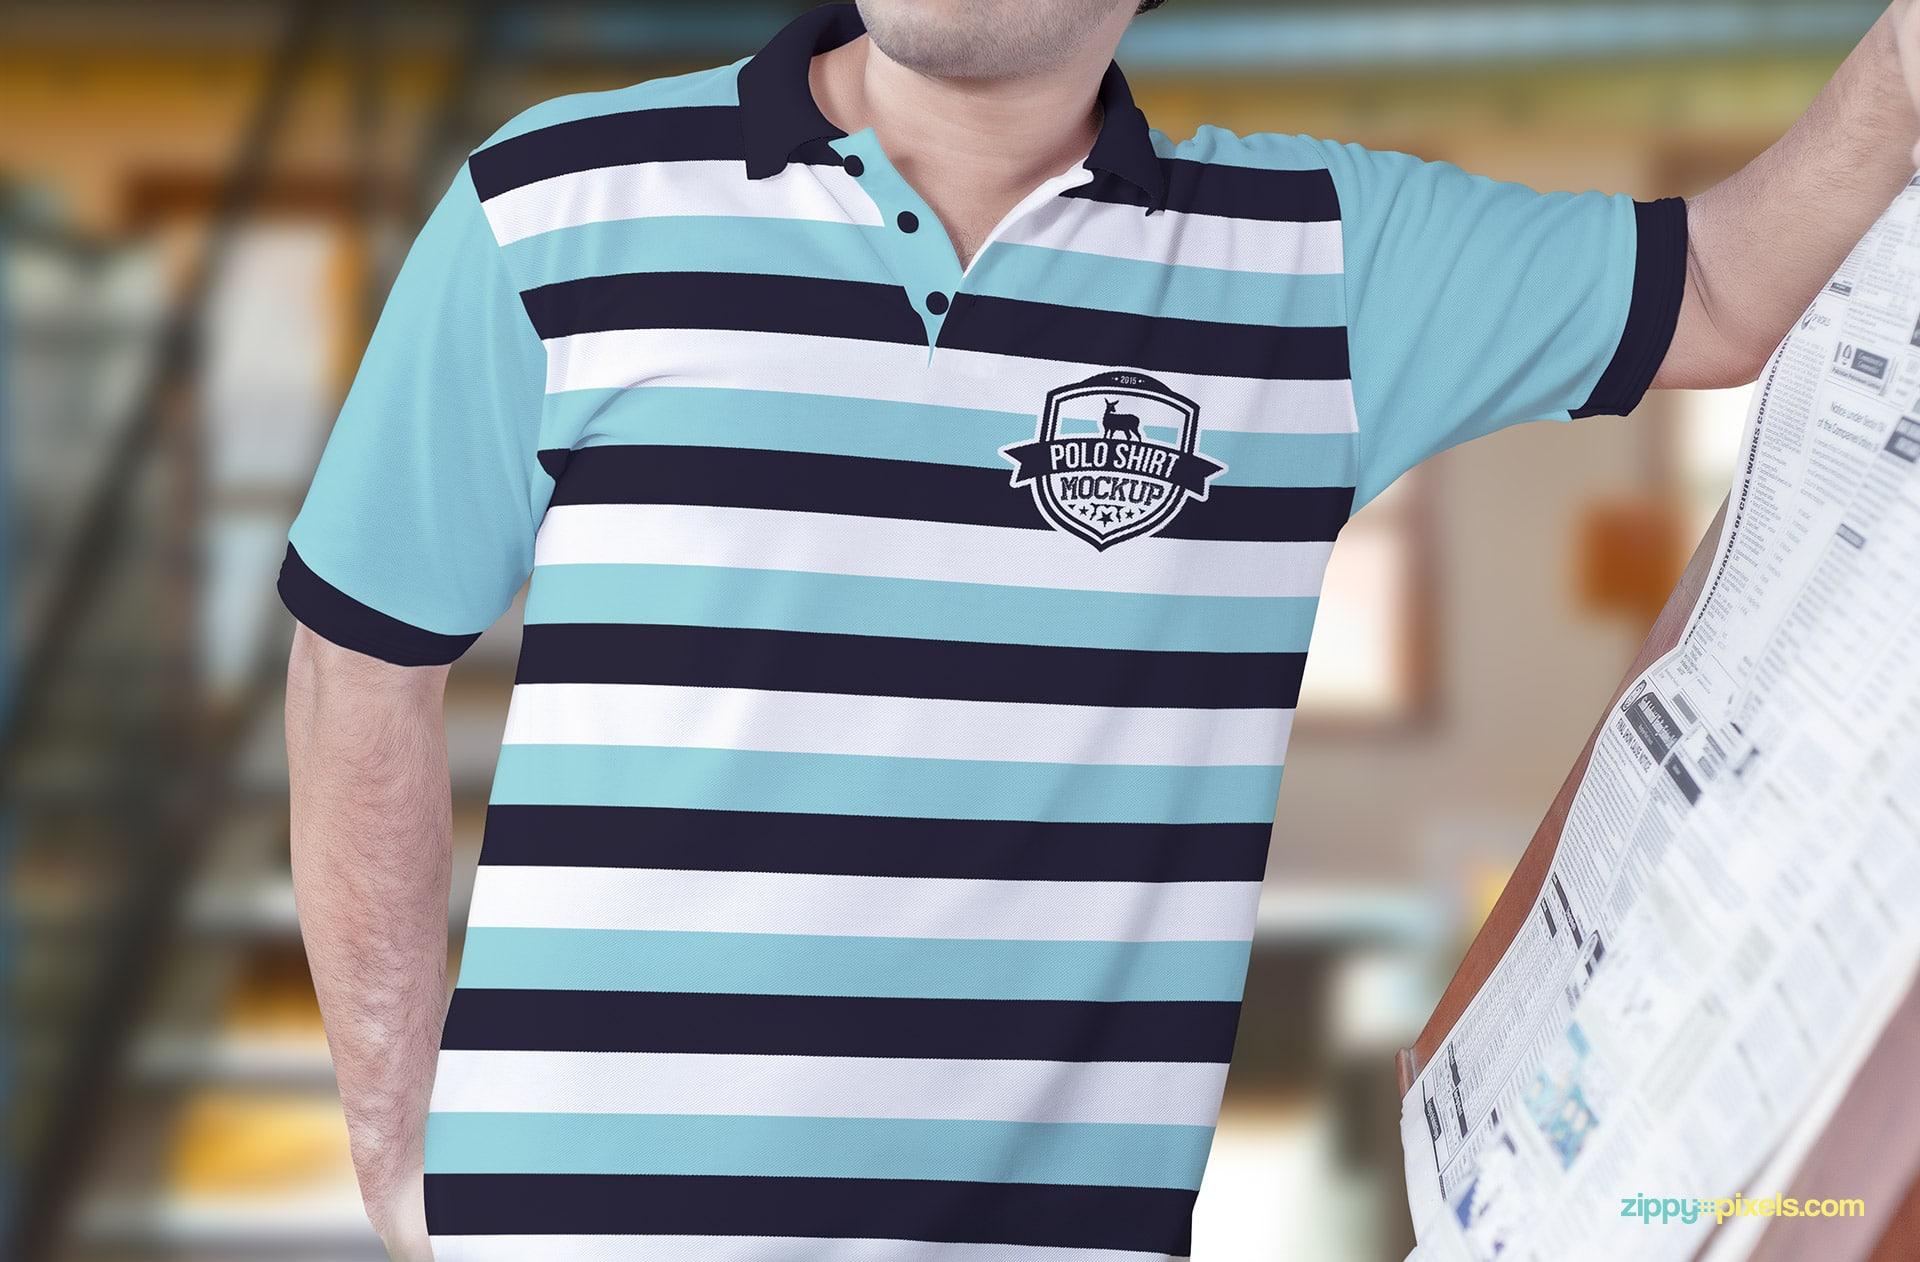 Model posing with a polo shirt mockup